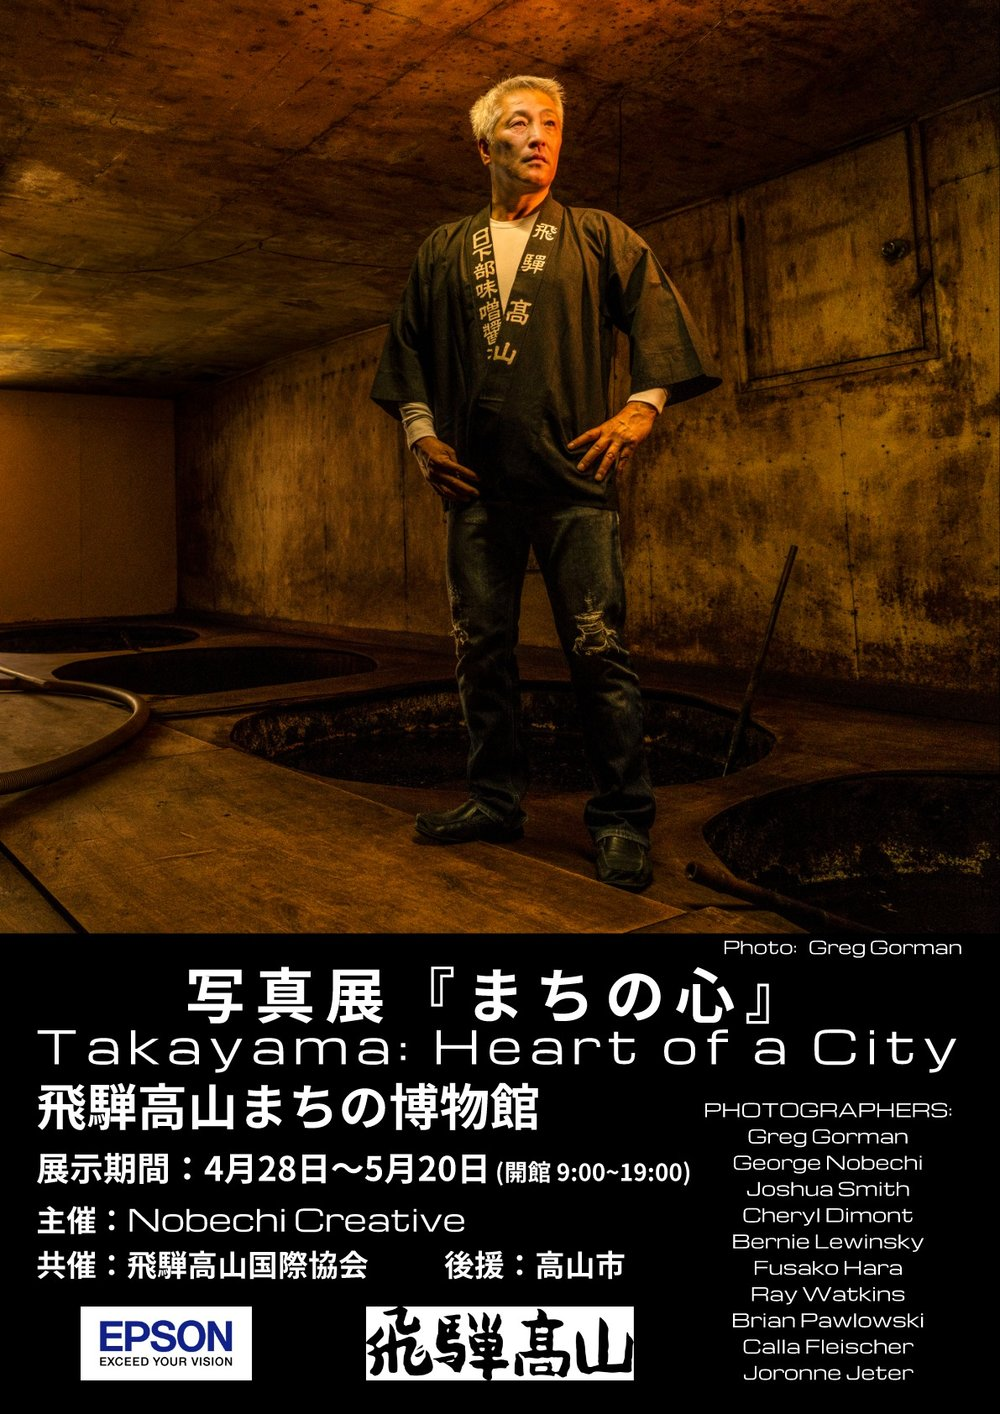 Takayama Exhibition Poster (1).jpeg